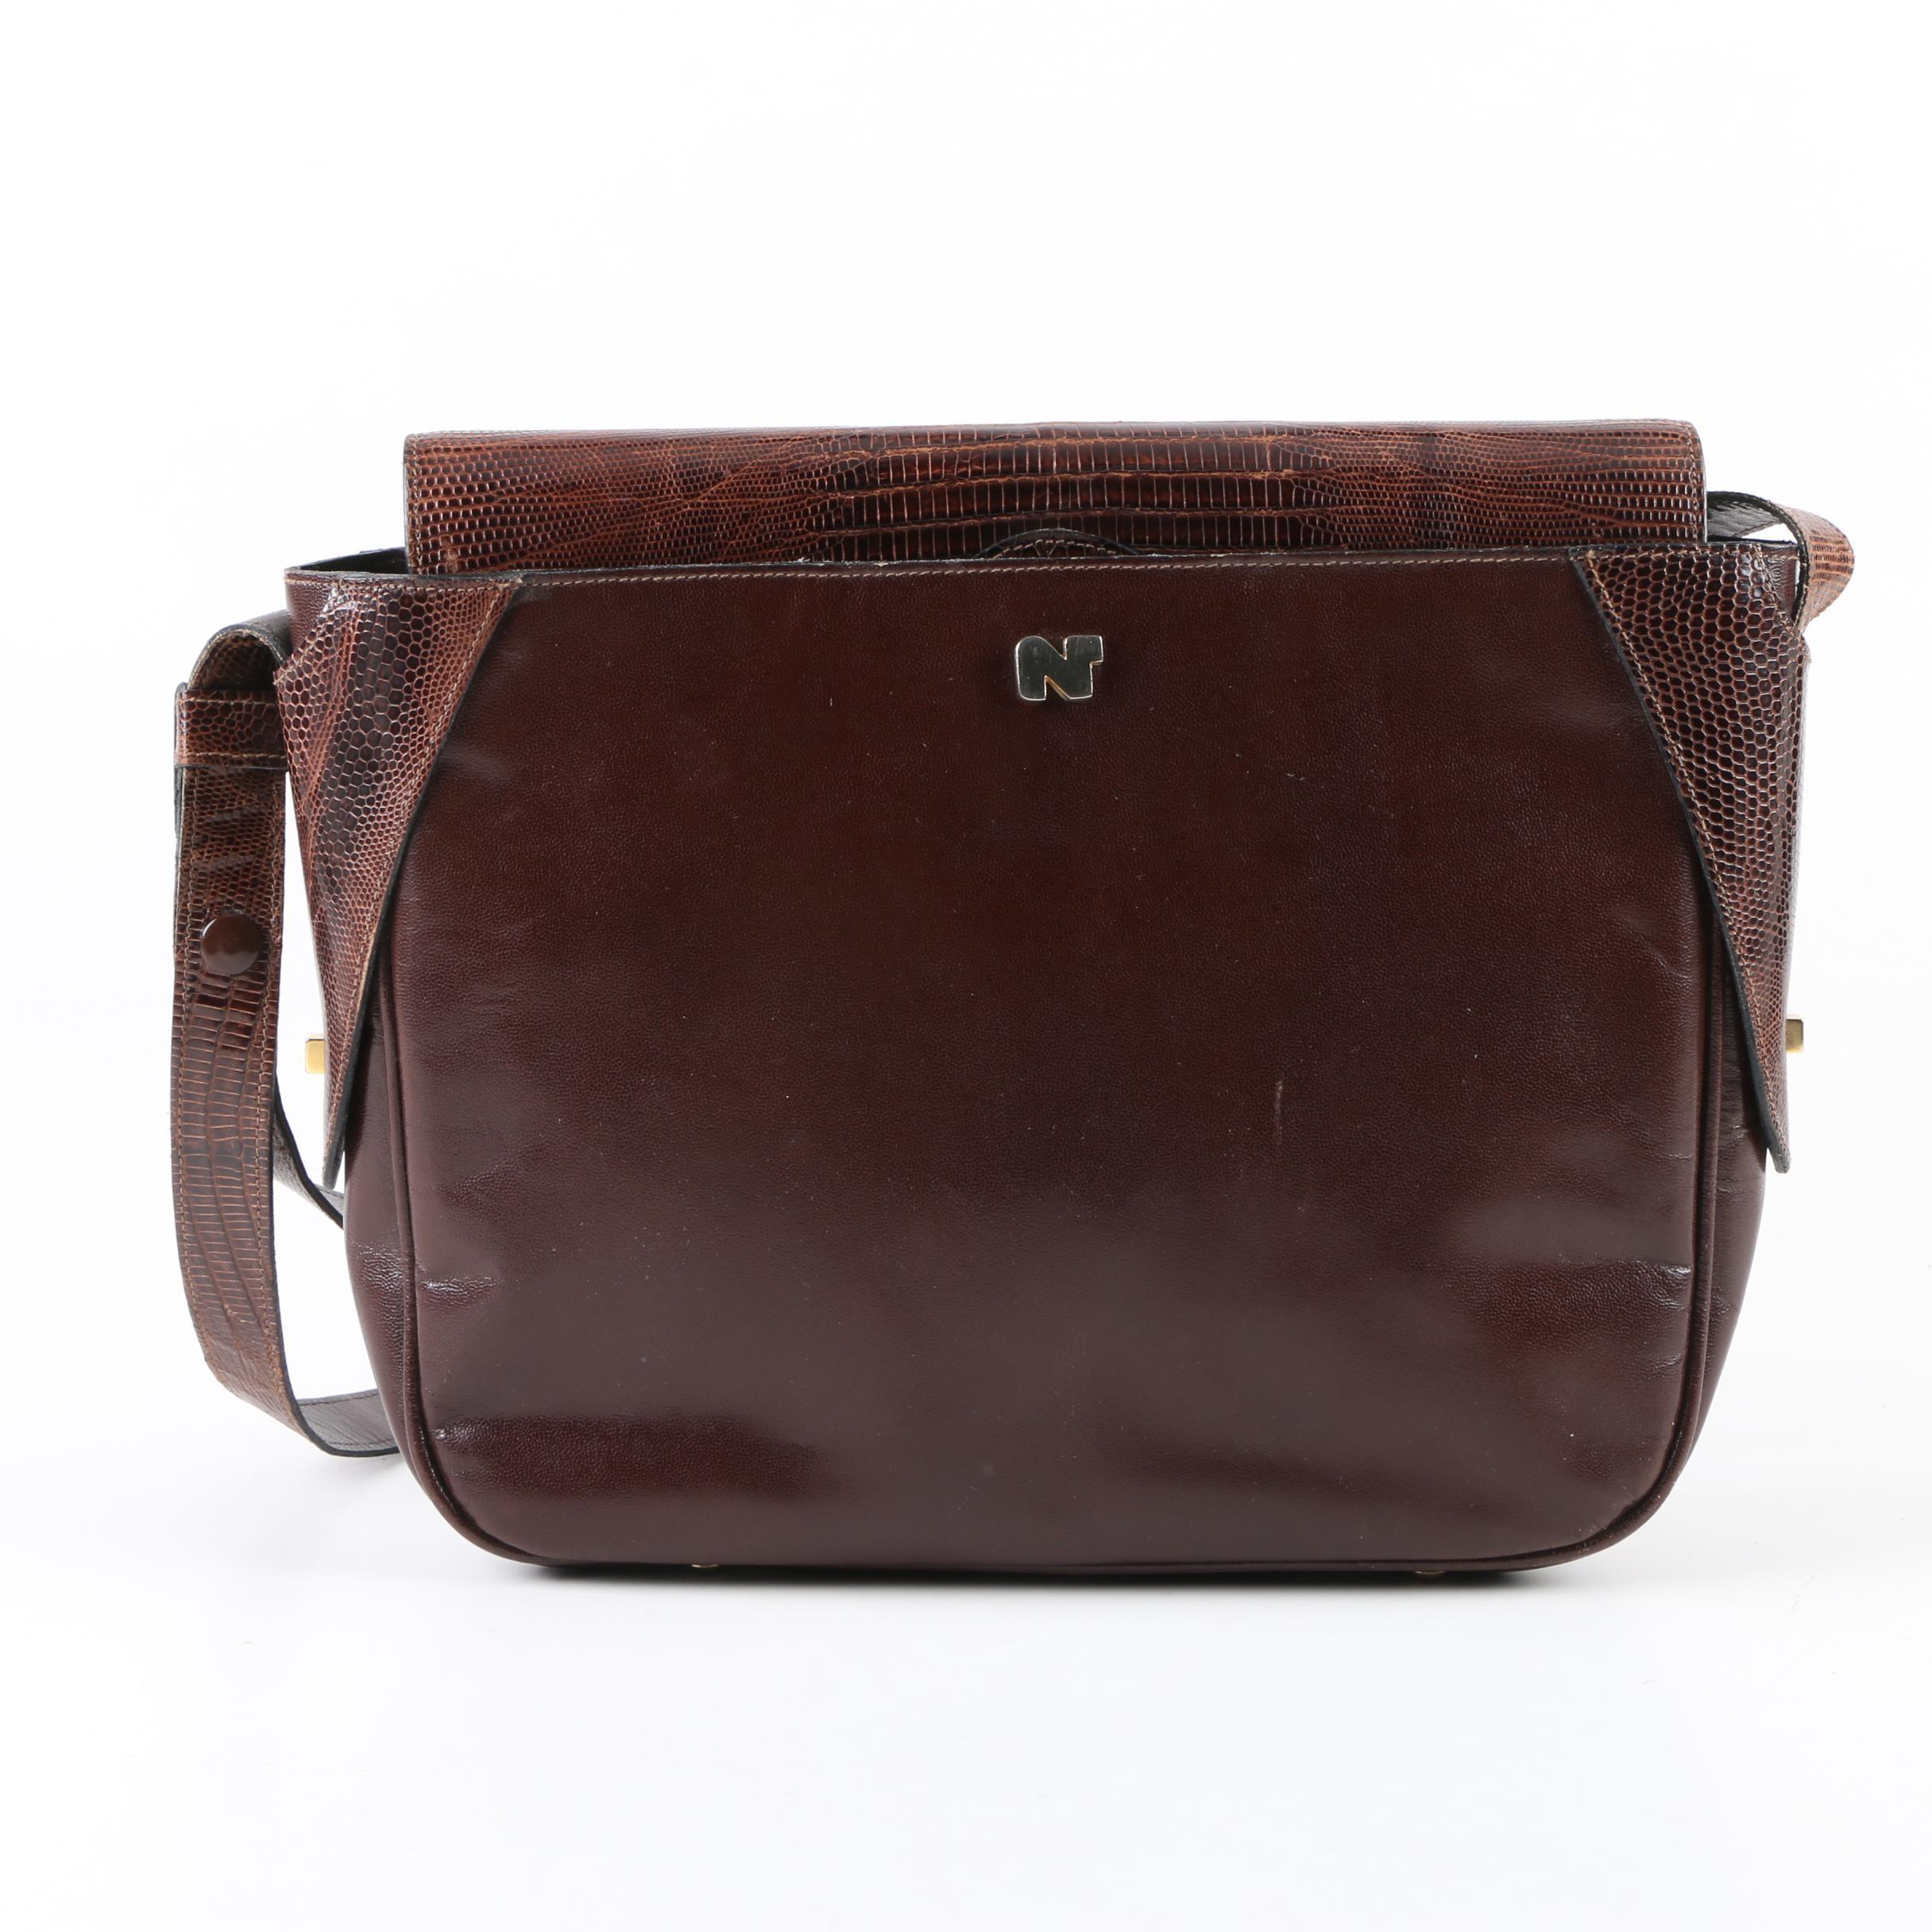 Vintage Nina Ricci Paris Mahogany Leather Shoulder Bag with Embossed Lizard Skin